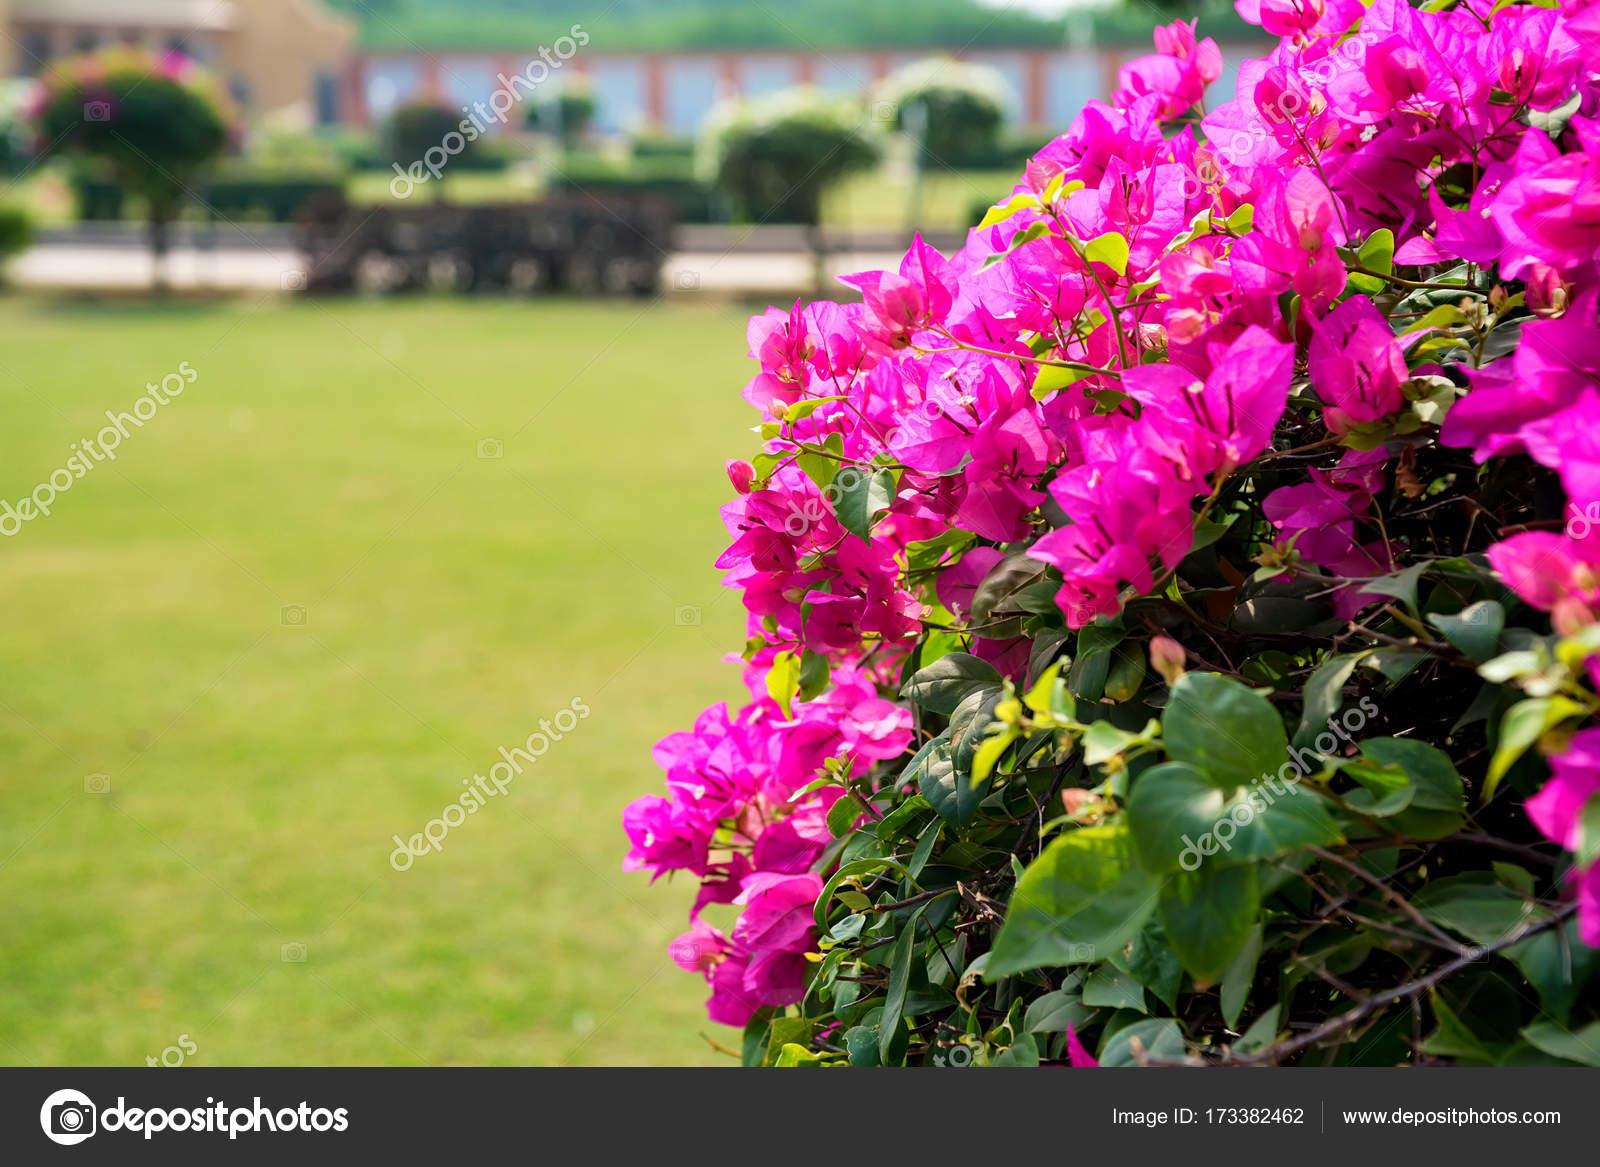 fleur de bougainvillier rose — photographie yakov_oskanov © #173382462